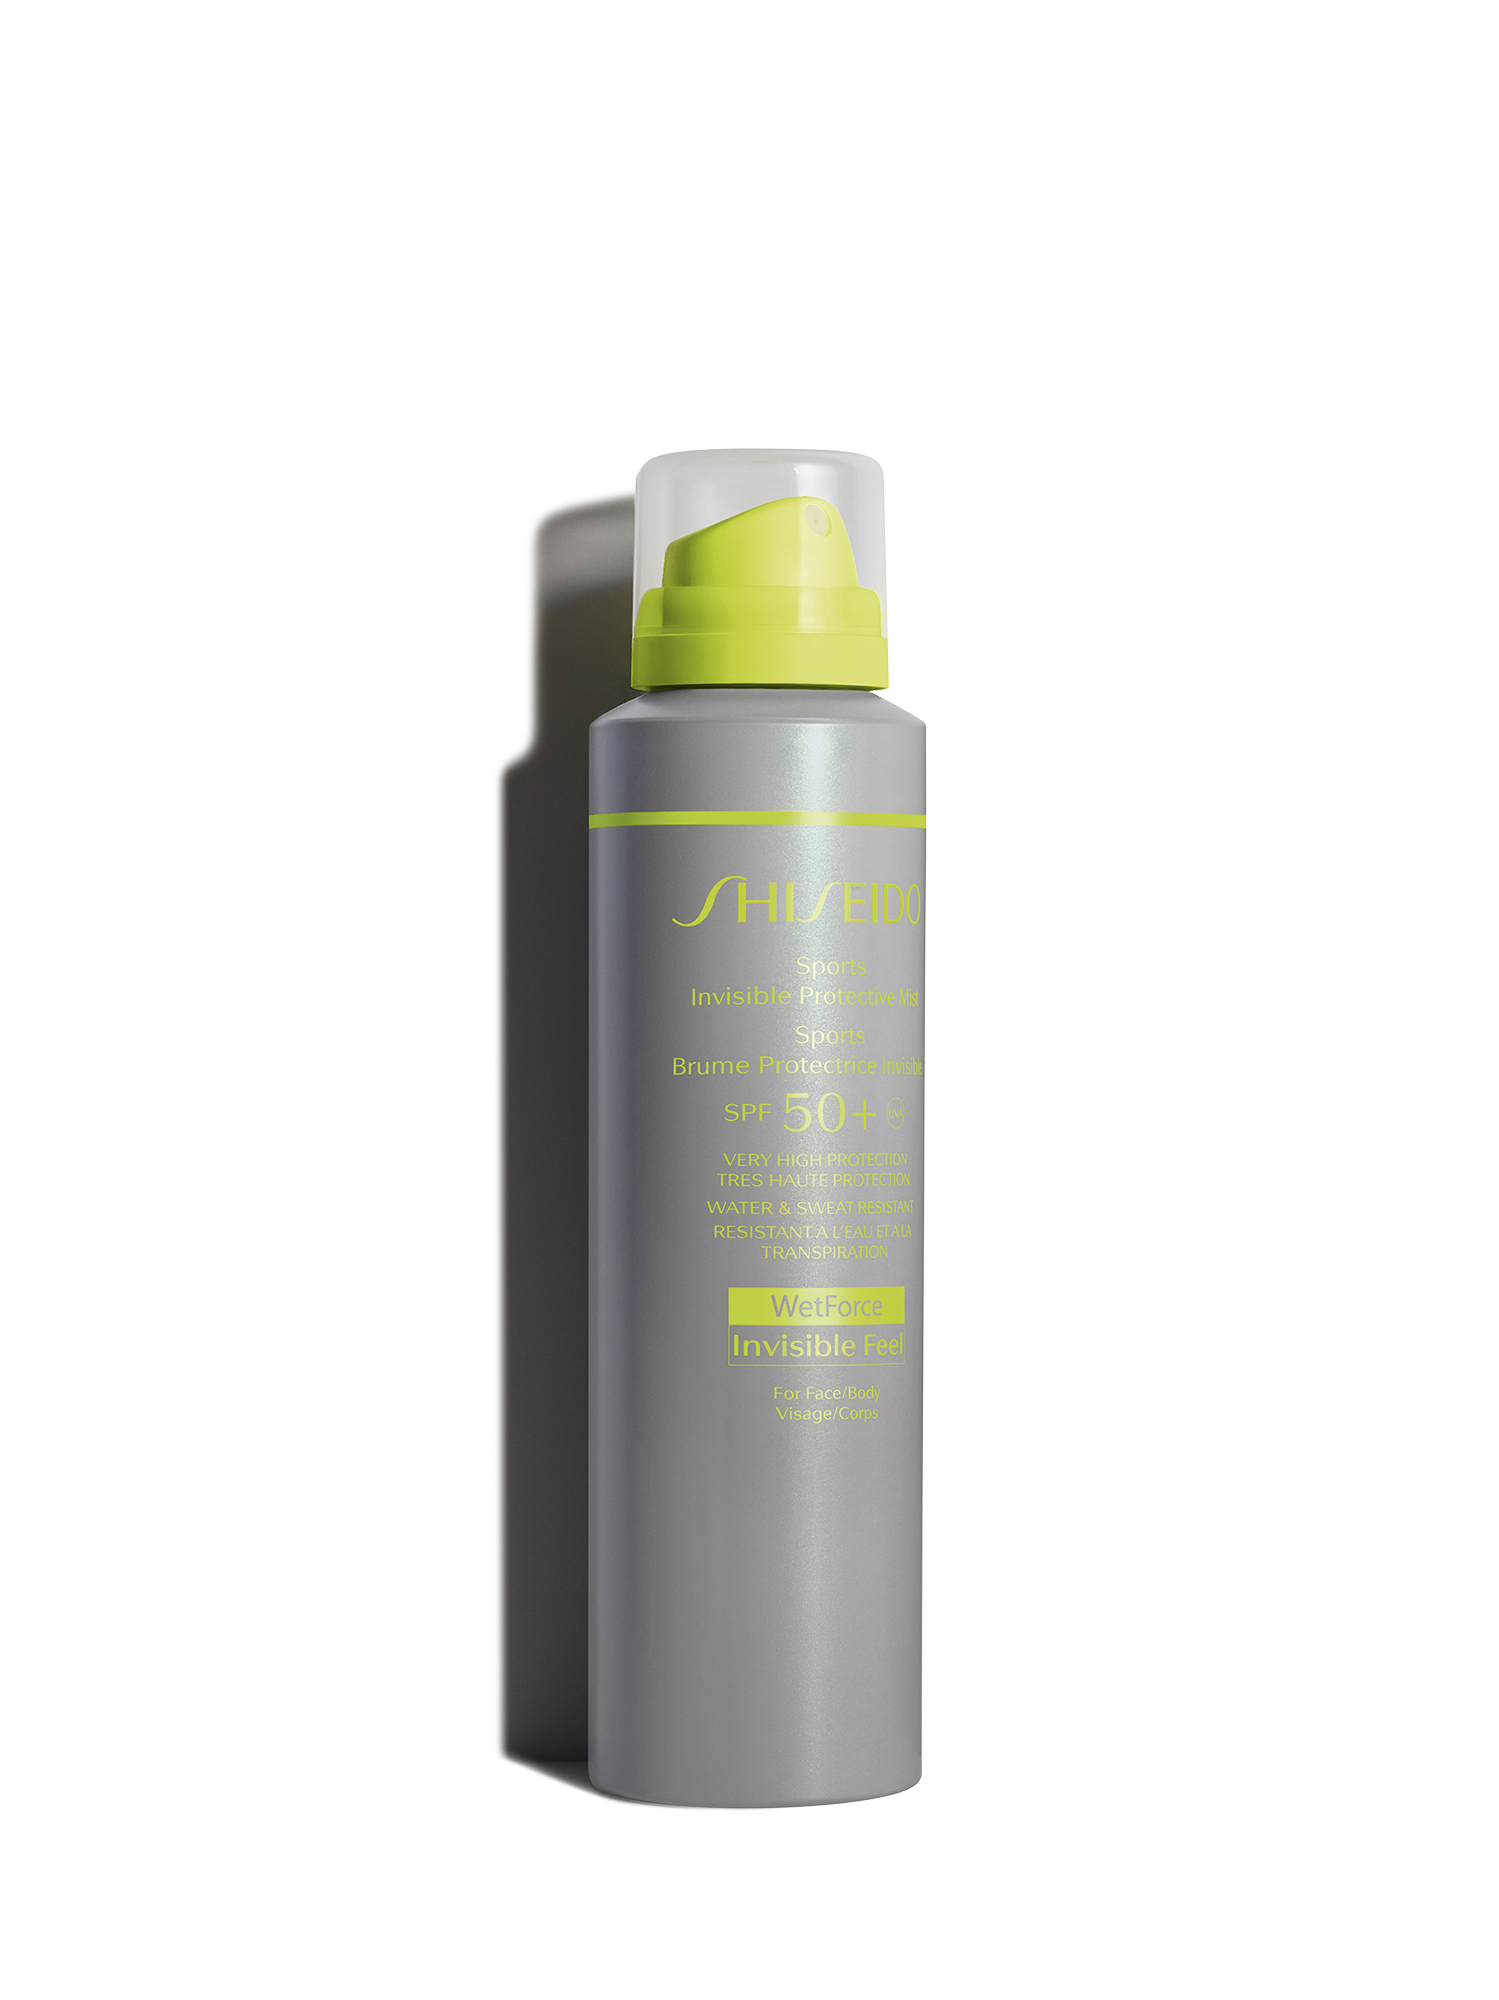 Shiseido Sport Protective Mist SPF50+, 150 ml